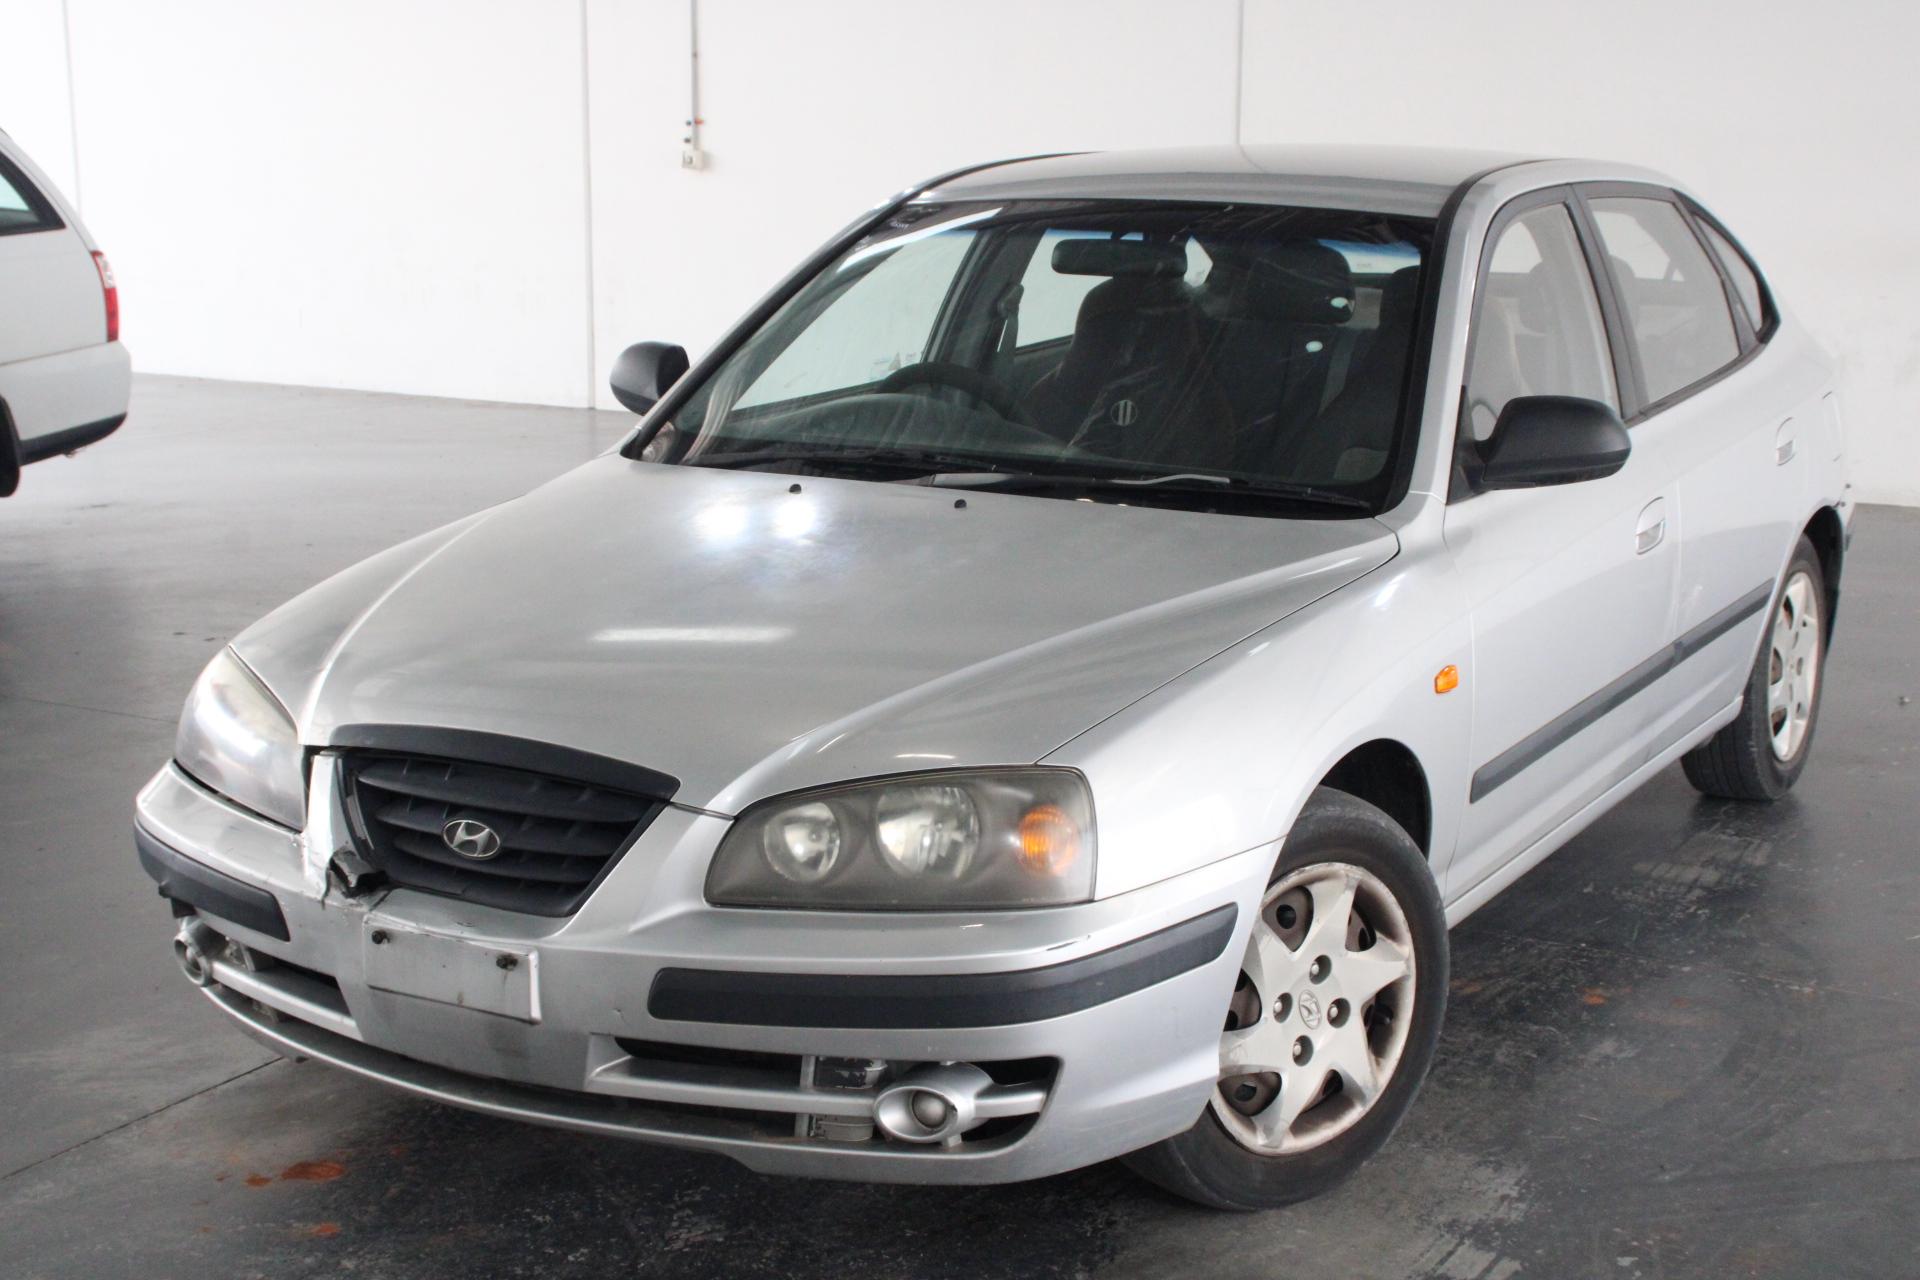 2004 Hyundai Elantra 2.0 HVT XD Automatic Hatchback